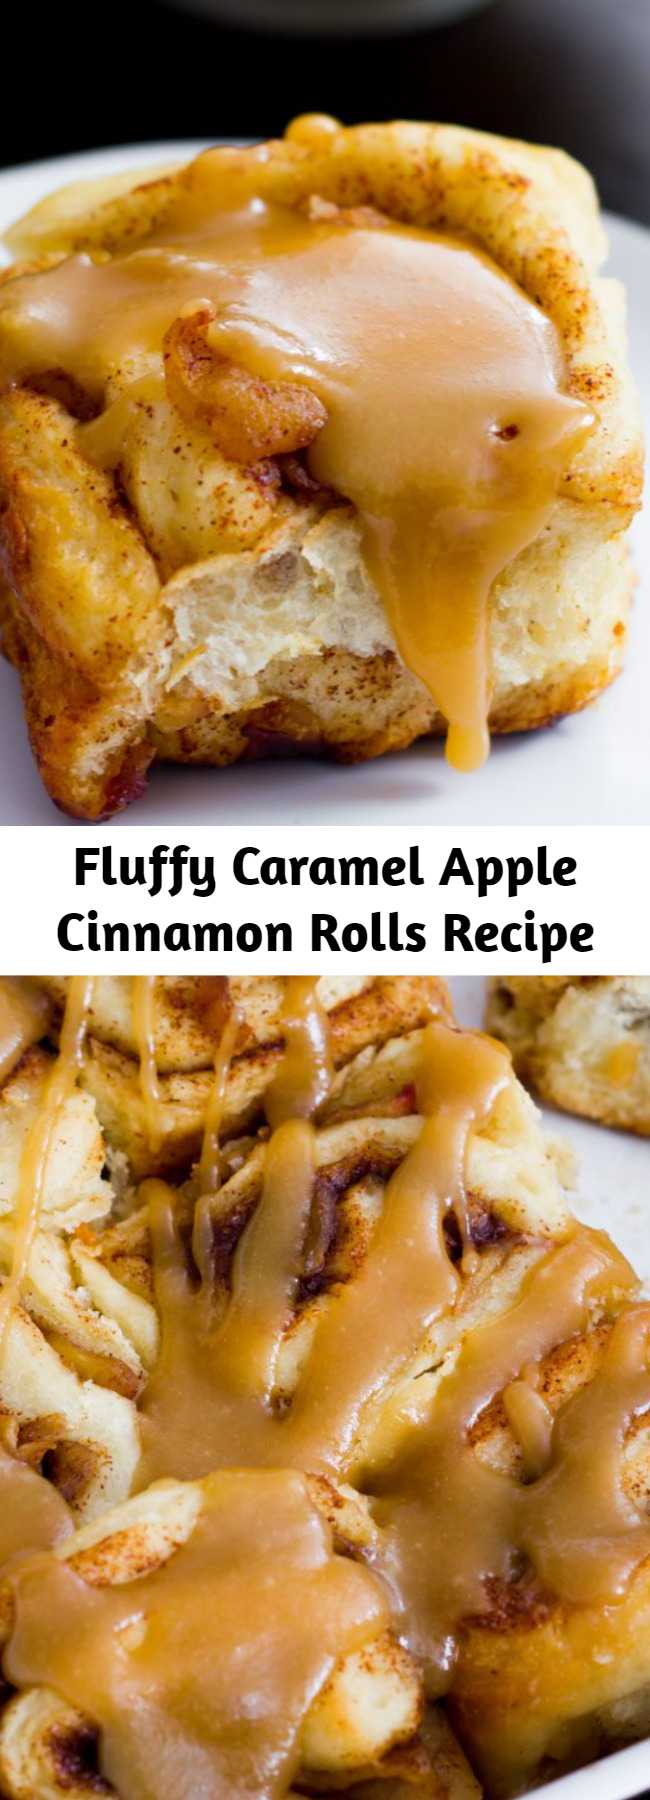 Fluffy Caramel Apple Cinnamon Rolls Recipe - Soft, fluffy cinnamon rolls stuffed with brown sugar & apples, and generously glazed with homemade caramel.